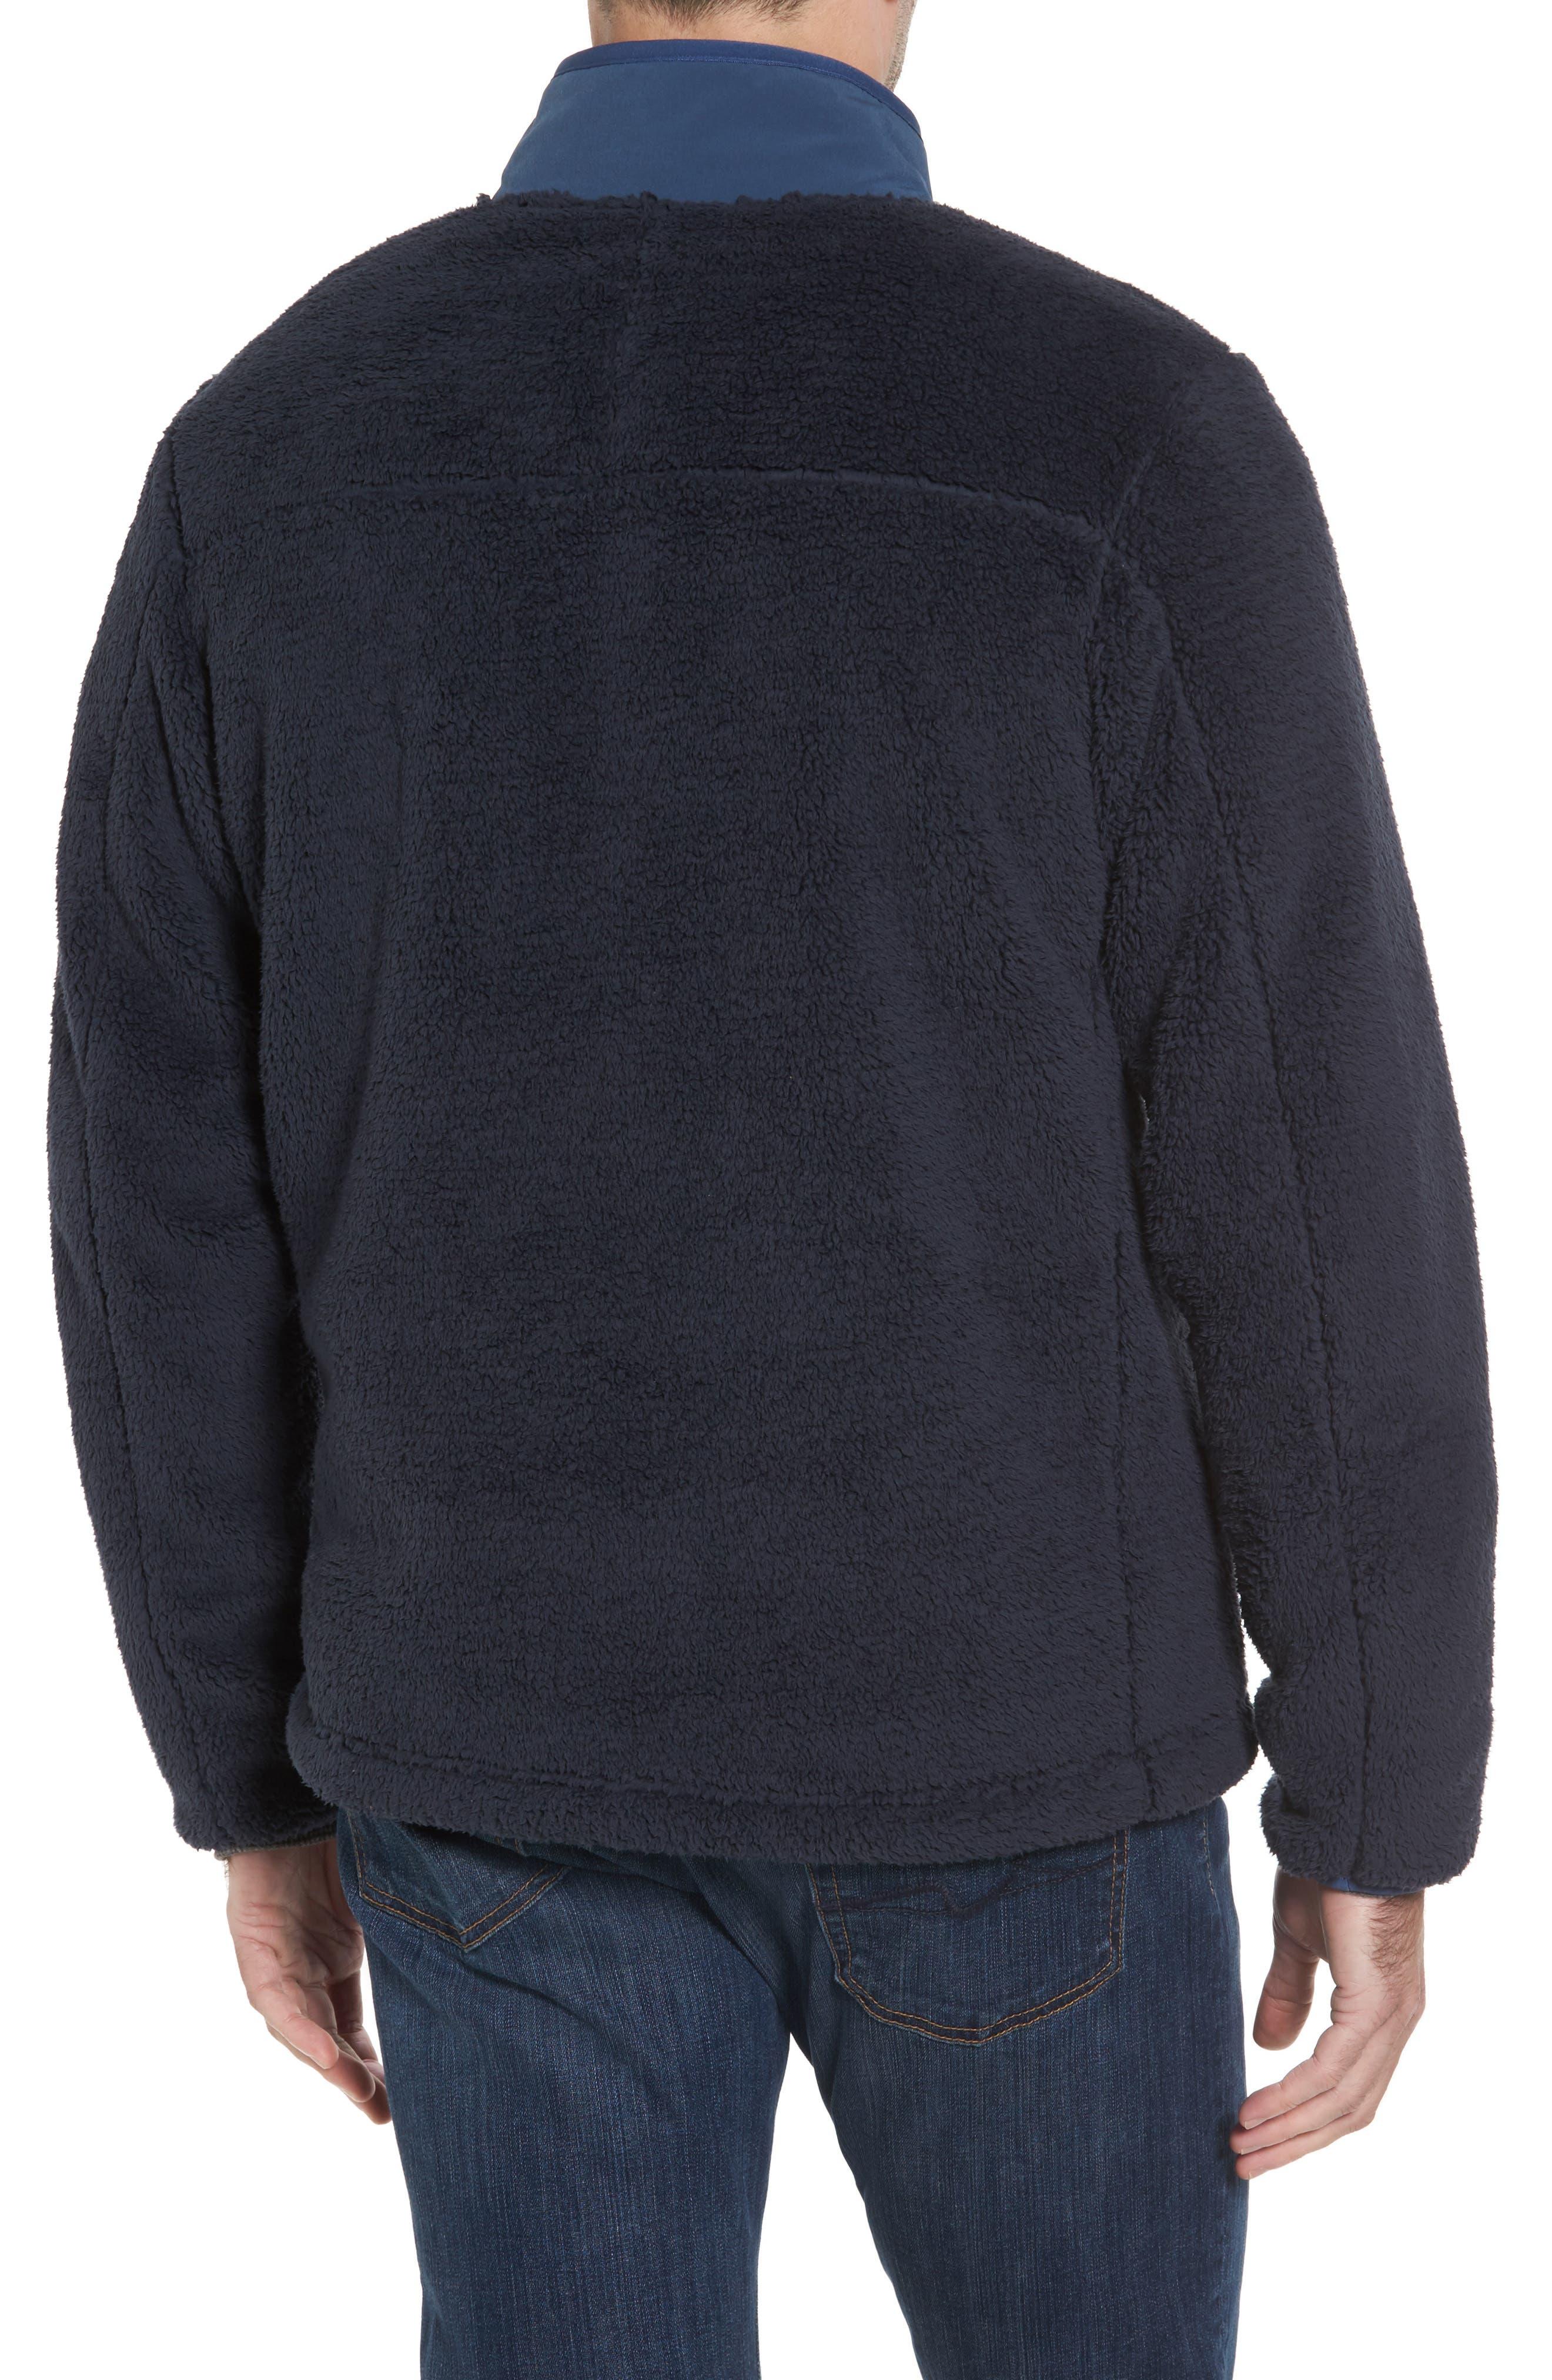 Campshire Zip Fleece Jacket,                             Alternate thumbnail 19, color,